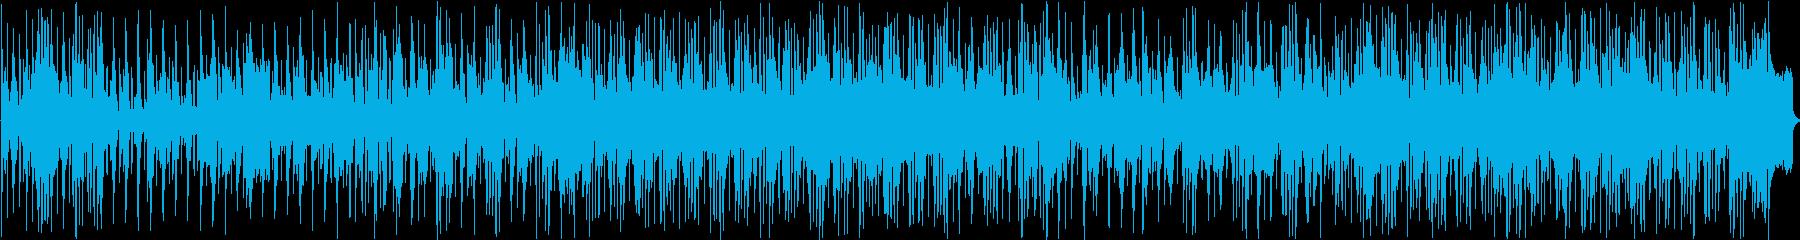 Duo Tumpet&sax、ドラ...の再生済みの波形